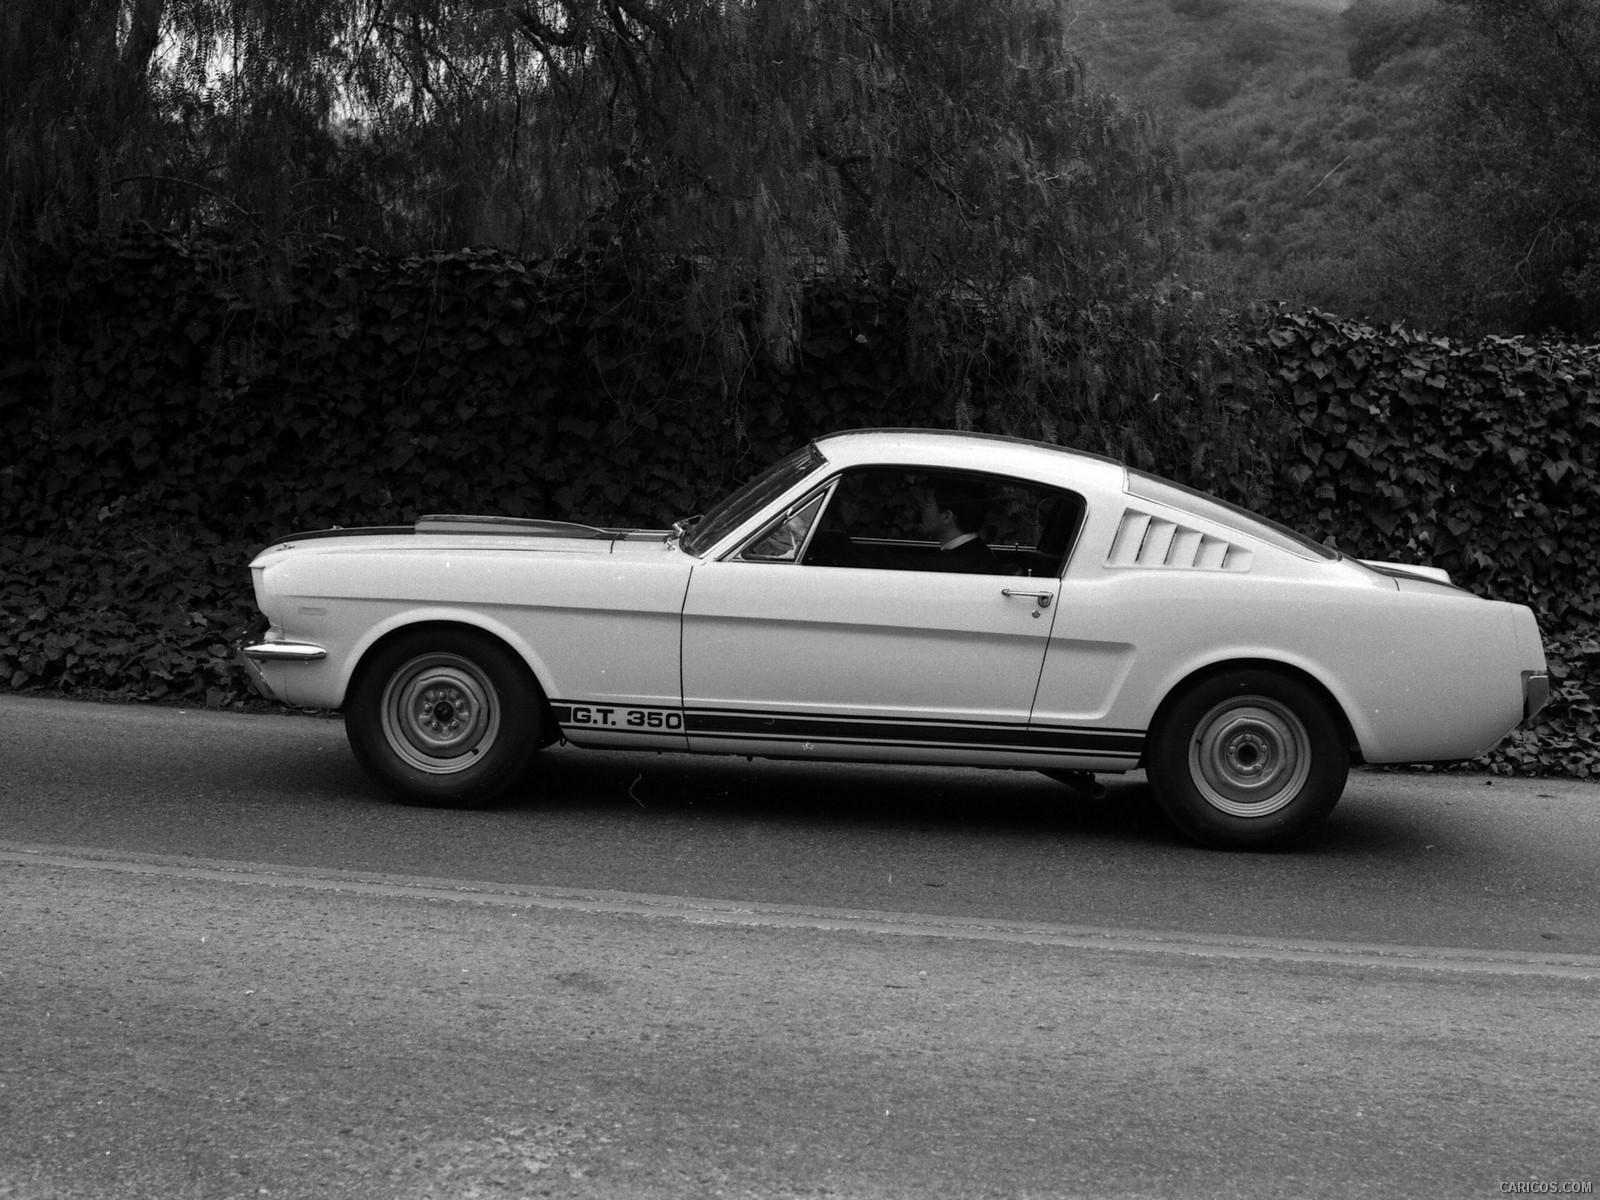 Ford Mustang Shelby GT350 8k duvarkağıdı